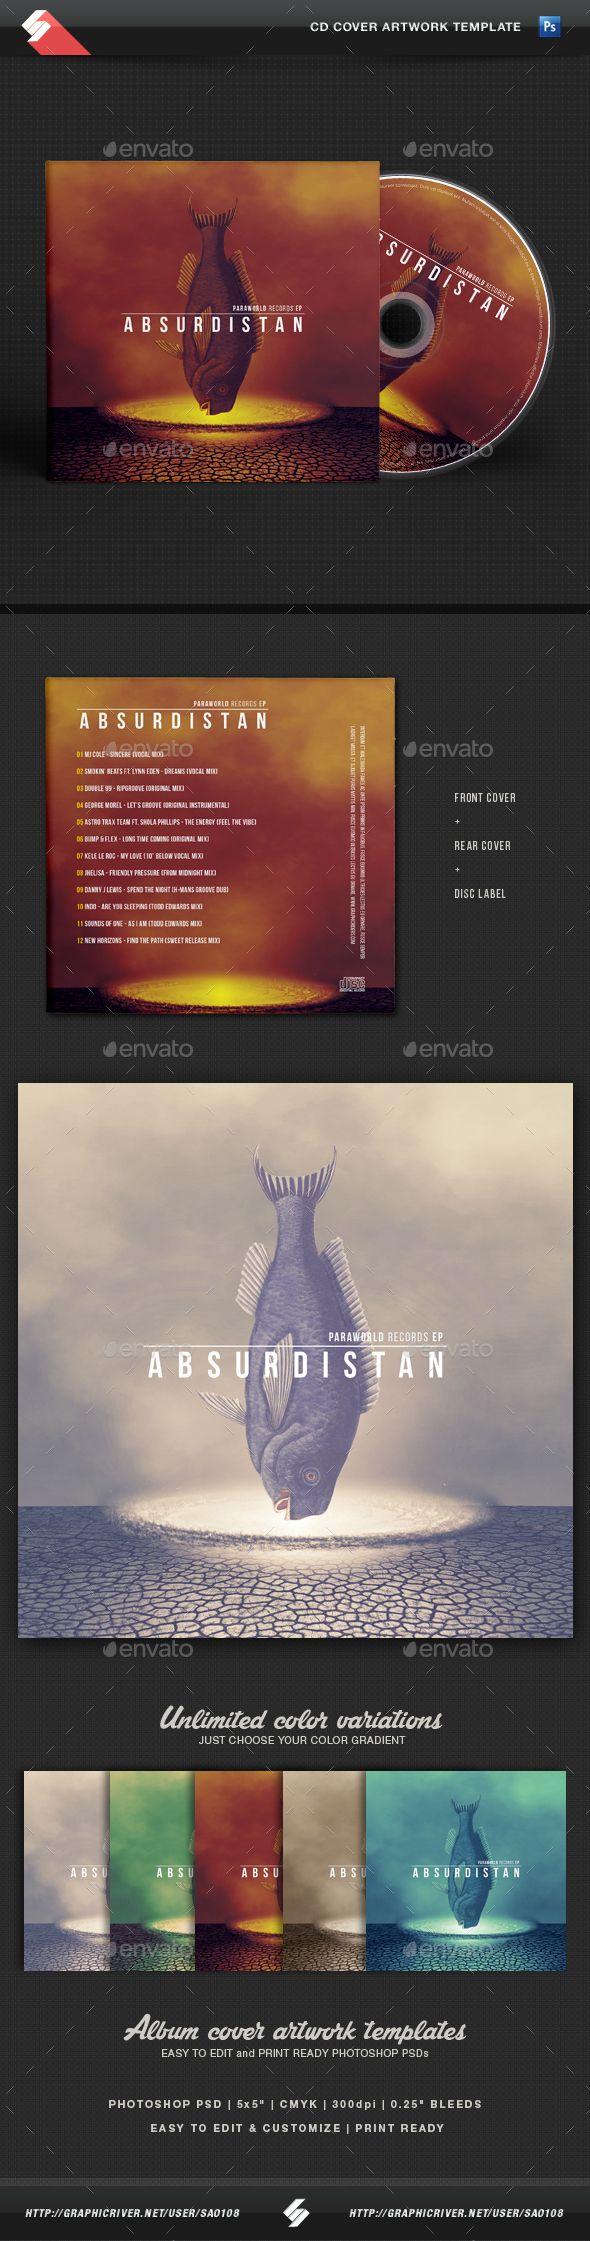 absurdistan cd cover artwork template cd dvd templates